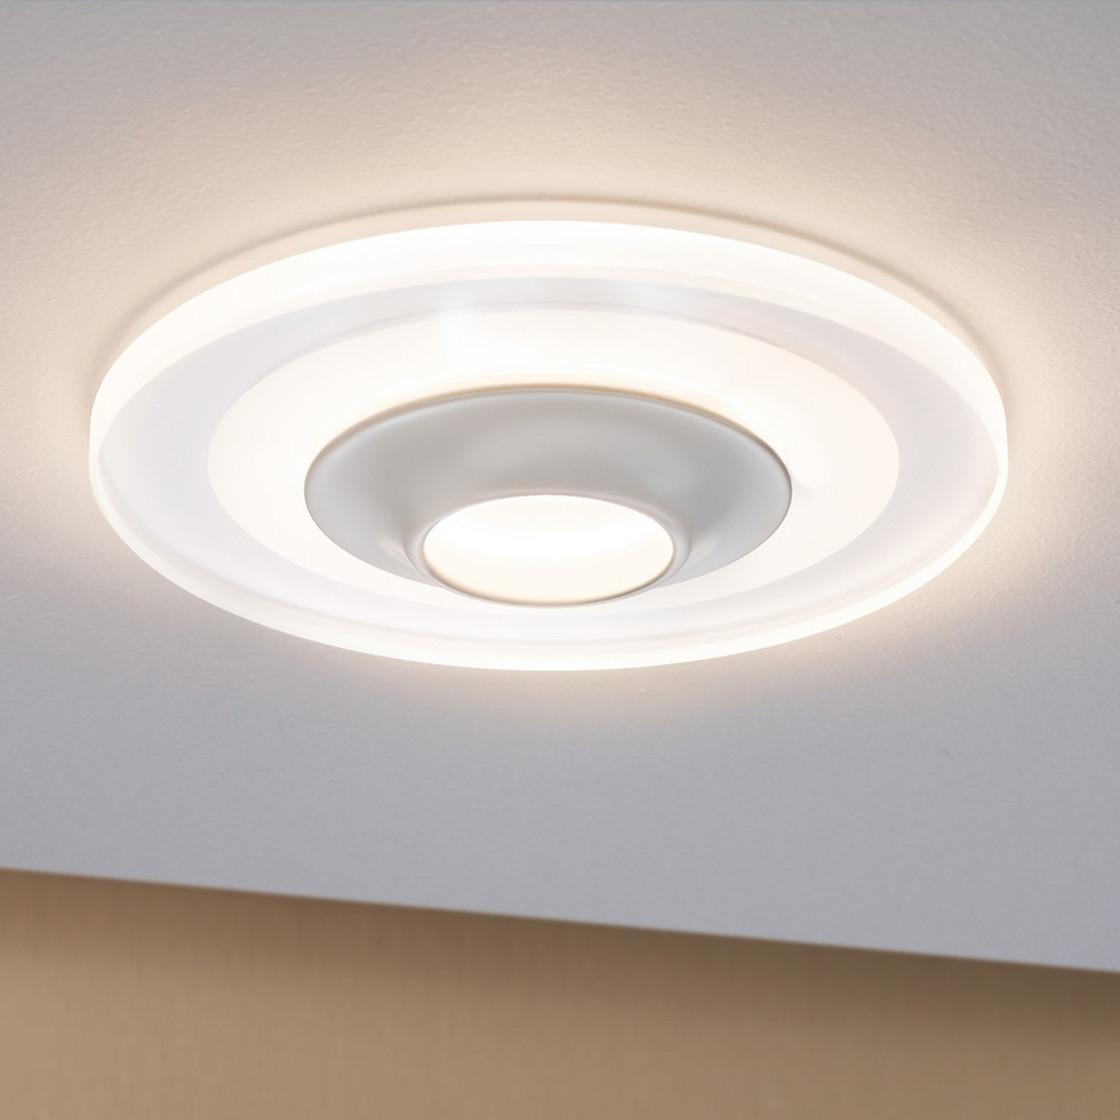 paulmann einbauleuchte led drip 8w weiss dimmbar inkl leuchtm 49 99. Black Bedroom Furniture Sets. Home Design Ideas